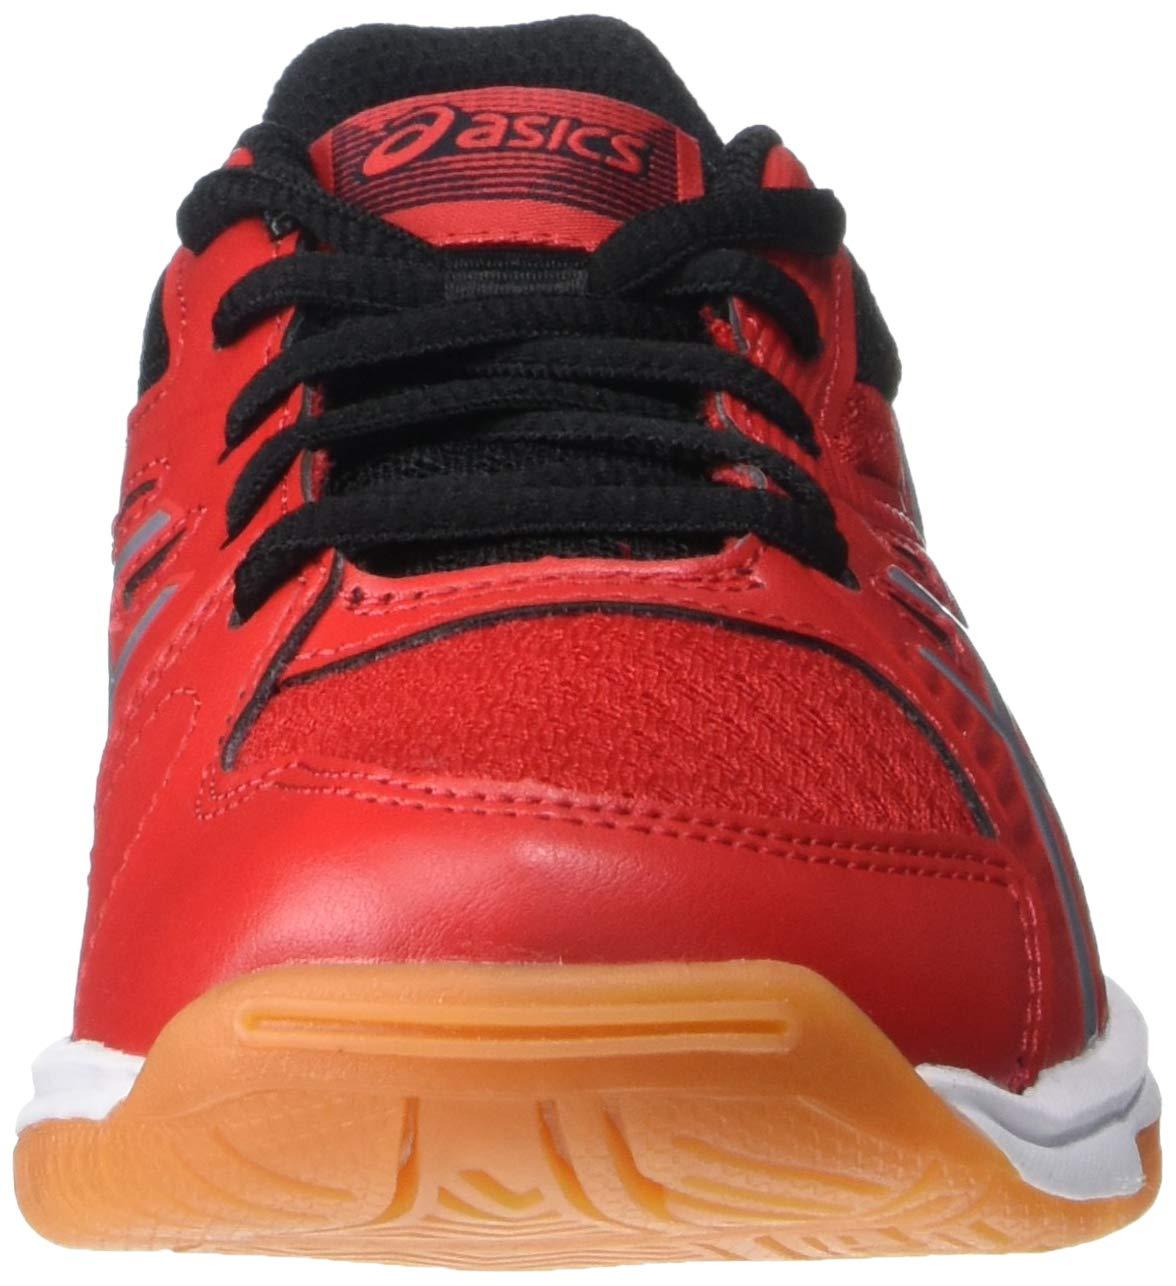 ASICS Kid's Upcourt 3 GS Court Shoes